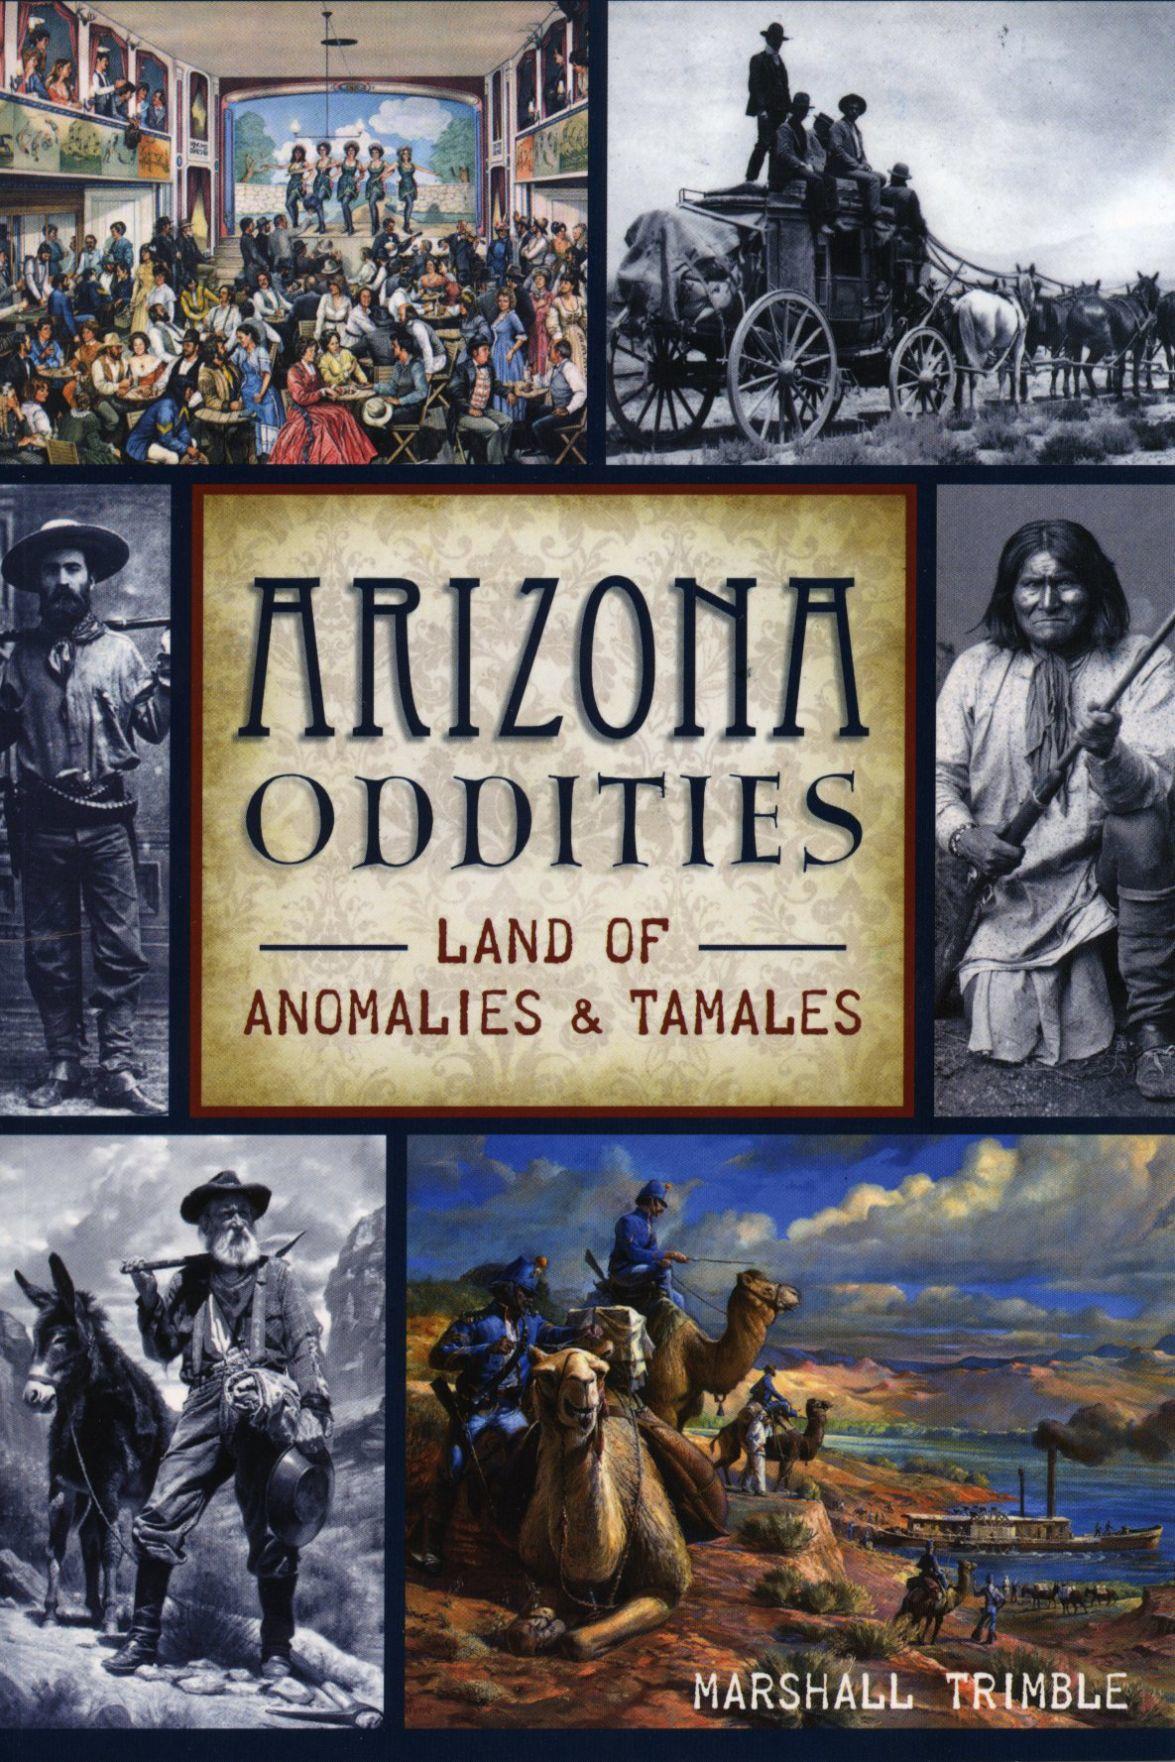 """Arizona Oddities, Land of Anomalies and Tamales"" by Marshall Trimble"